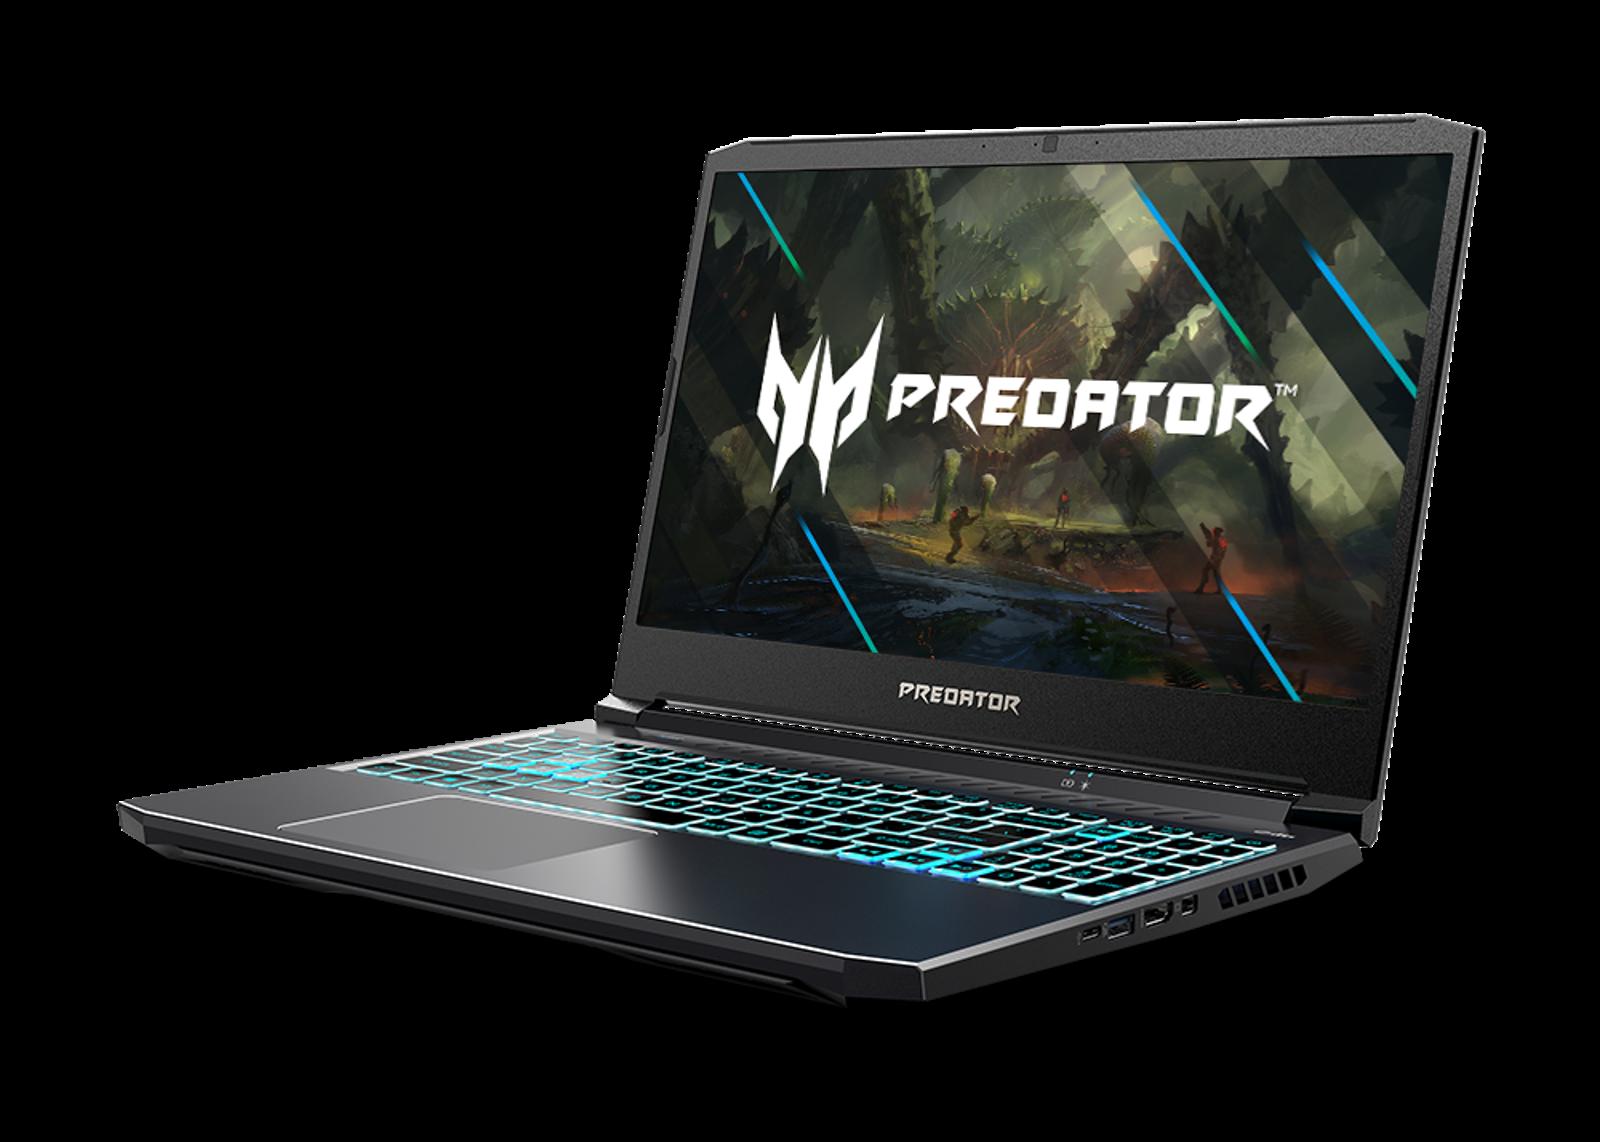 Acer Predator Helios 300 gaming notebook